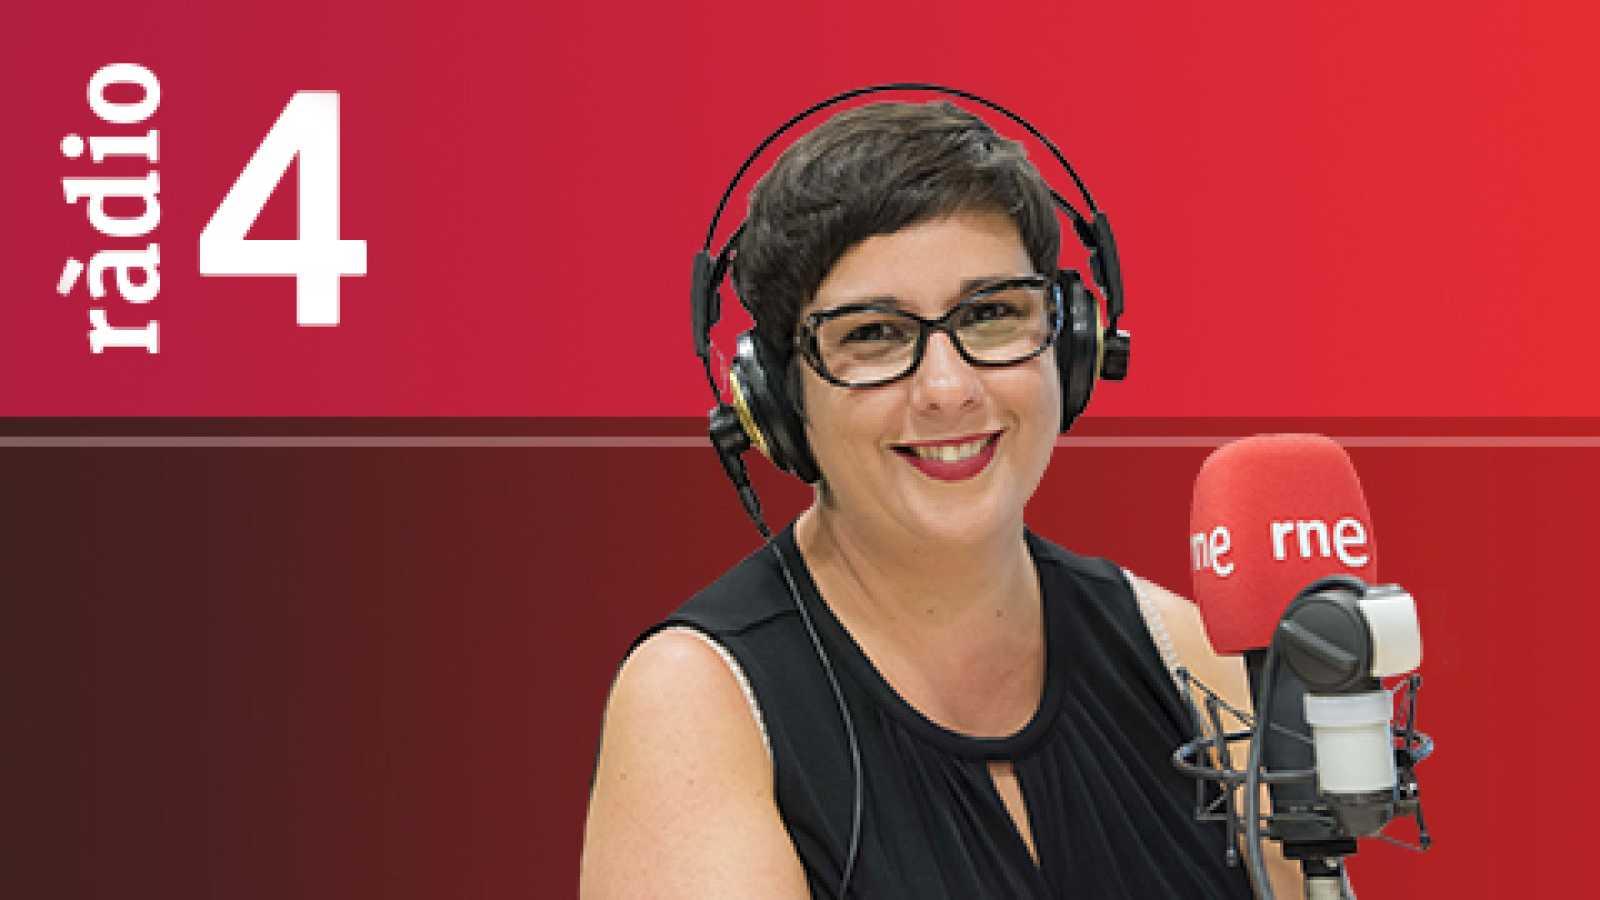 Realpolitik - Esther Niubó, José Rodríguez, Eva Parera